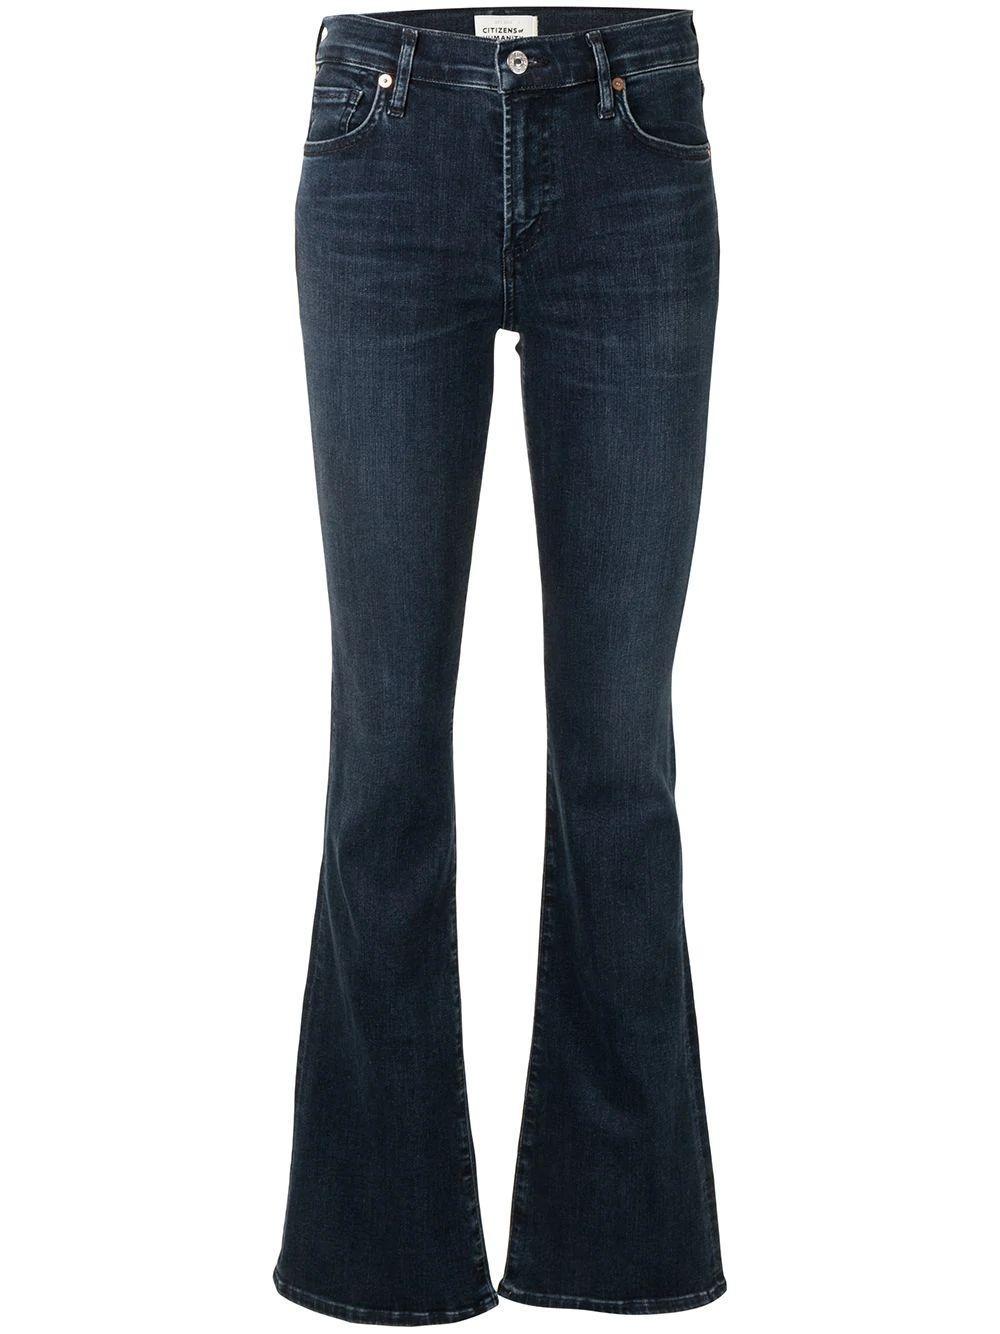 Emannuelle Bootcut Jeans